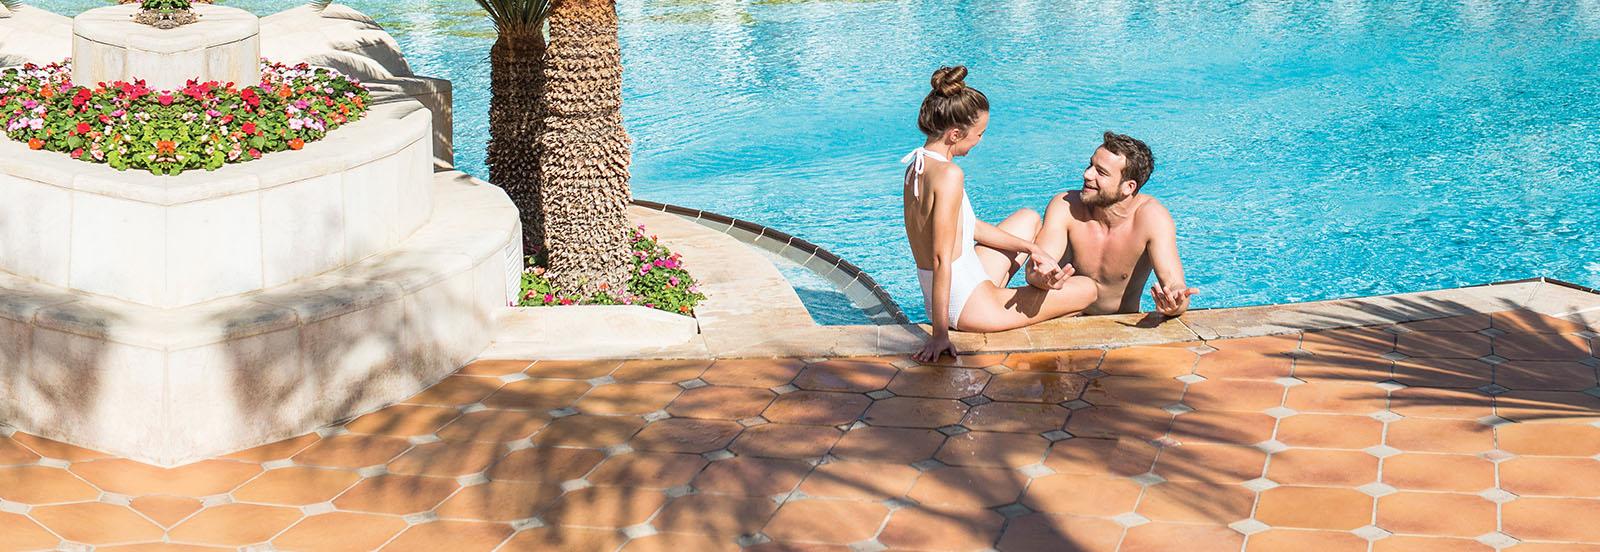 Isrotel Hotels